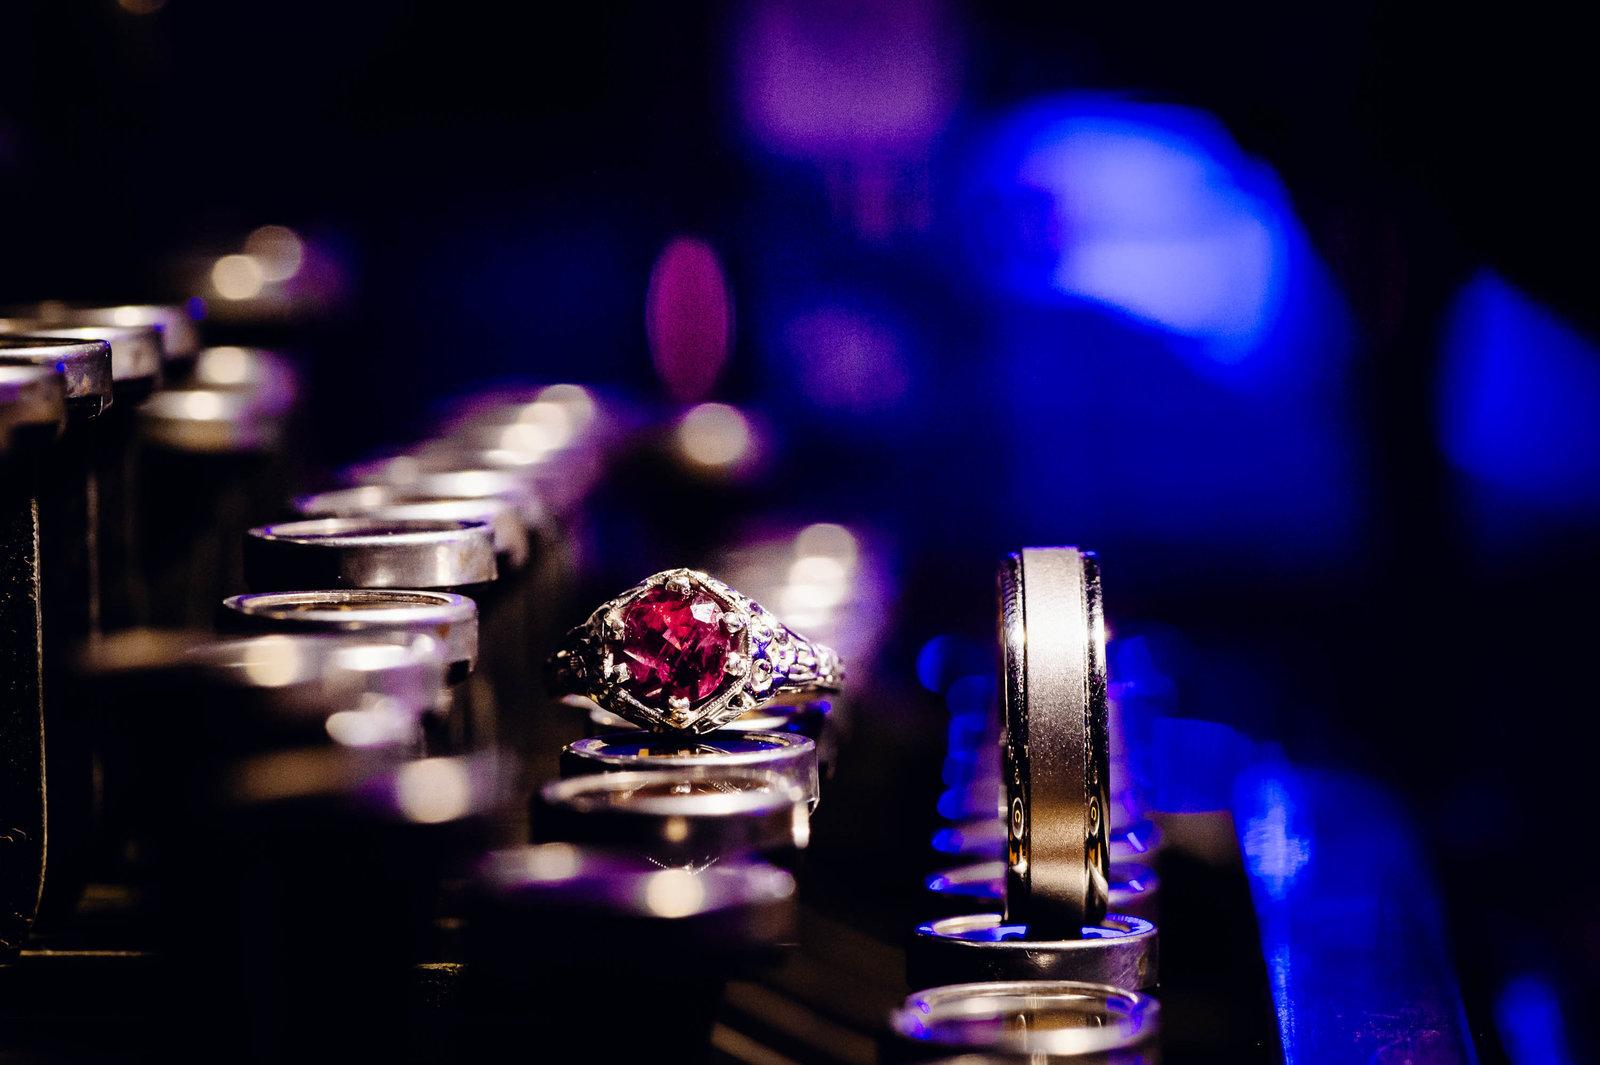 097-El-paso-wedding-photographer-AmJu_1021